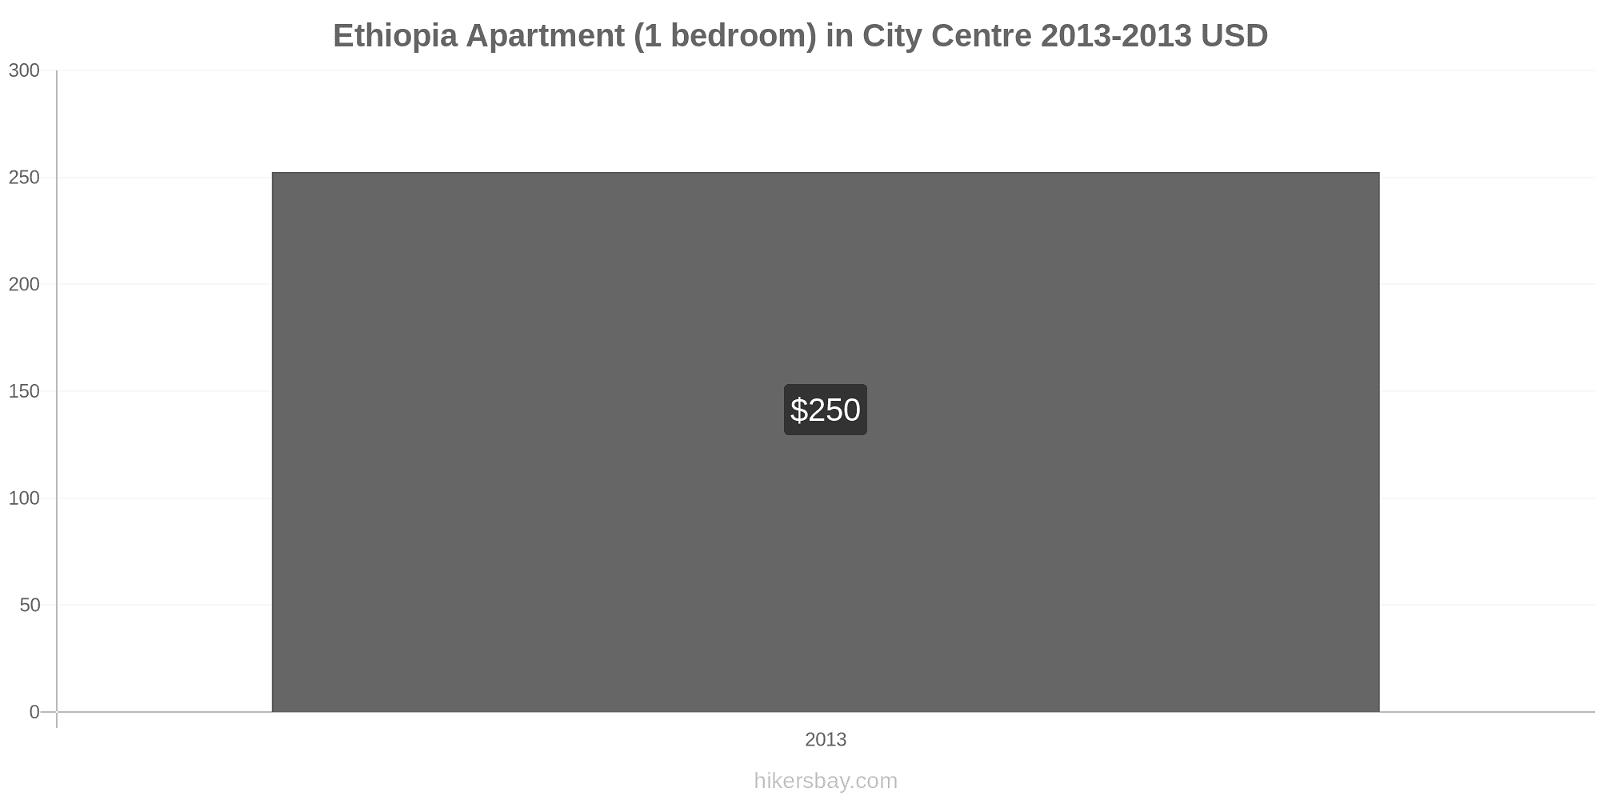 Ethiopia price changes Apartment (1 bedroom) in City Centre hikersbay.com